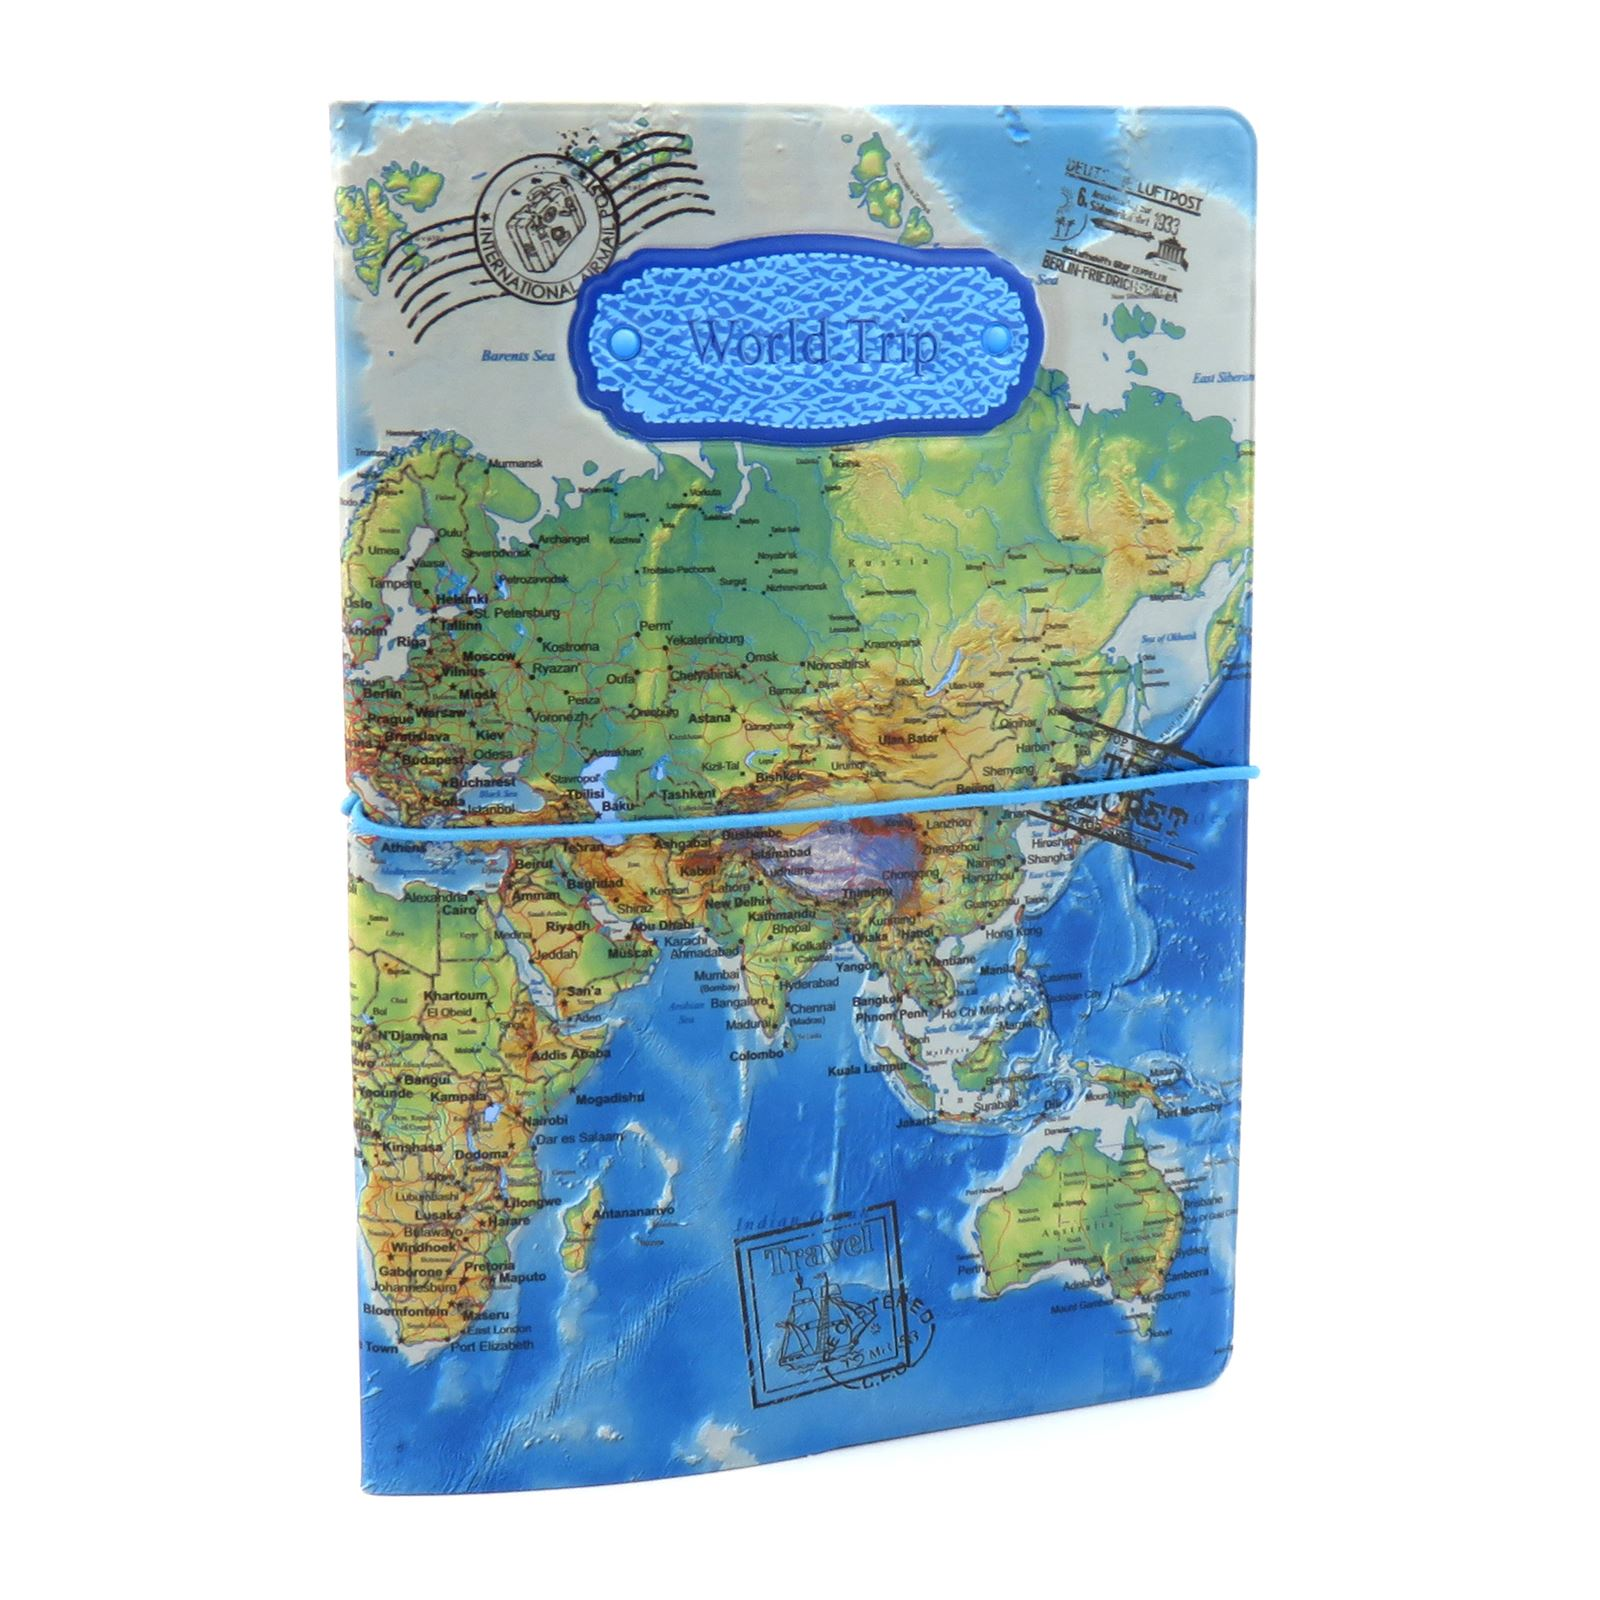 Passport holder wallet case travel world map id ticket receipt porta pasaporte billetera estuche de viaje organizador de gumiabroncs Gallery